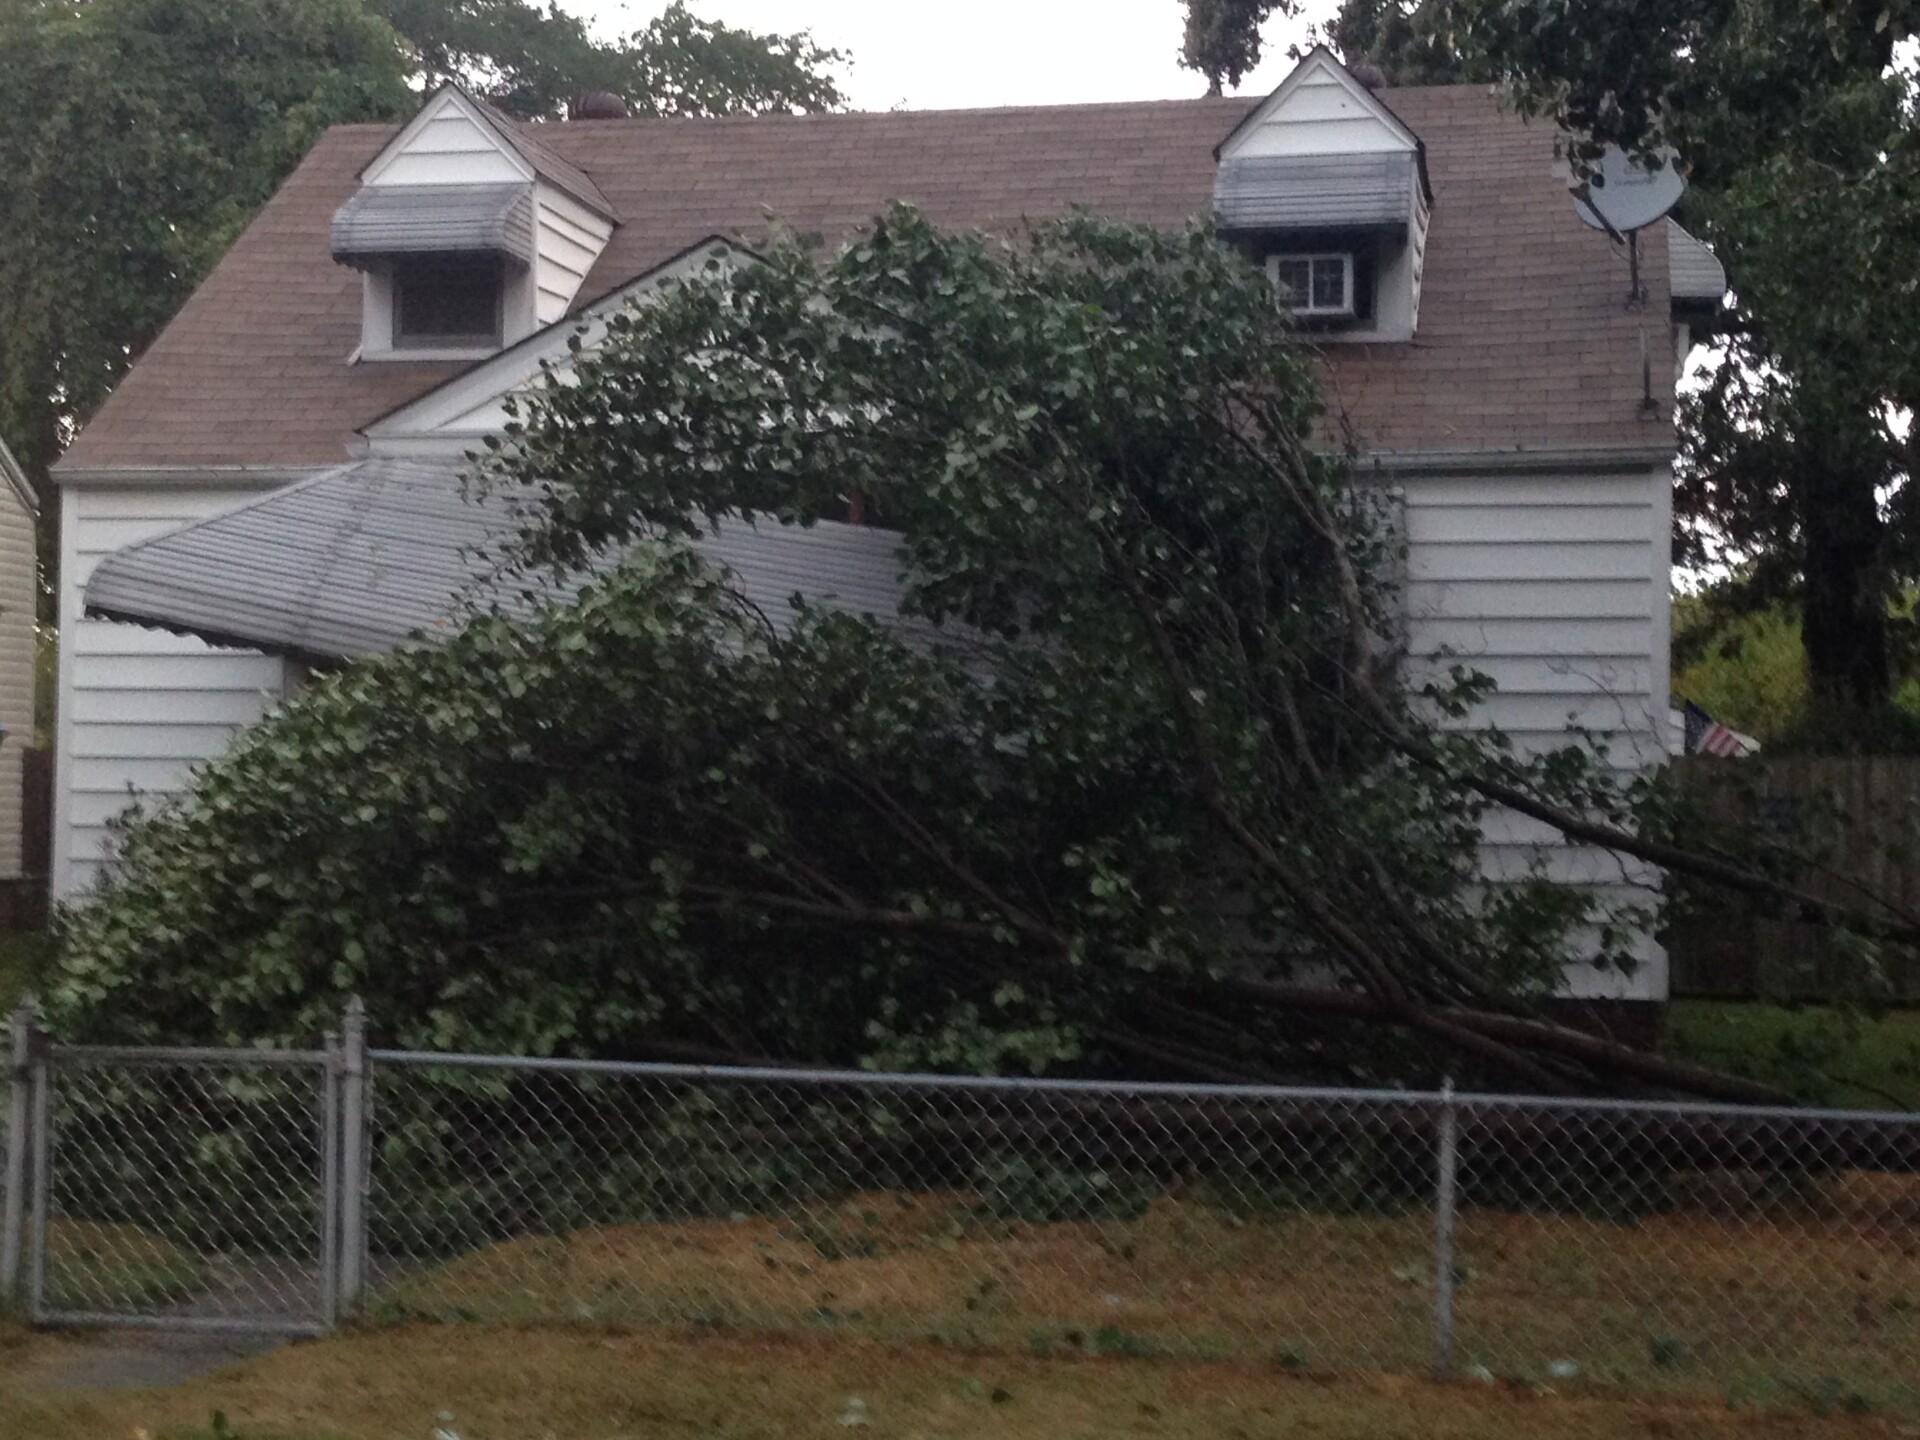 Photos: Storms bring down trees; lightning hits Norfolkapartment